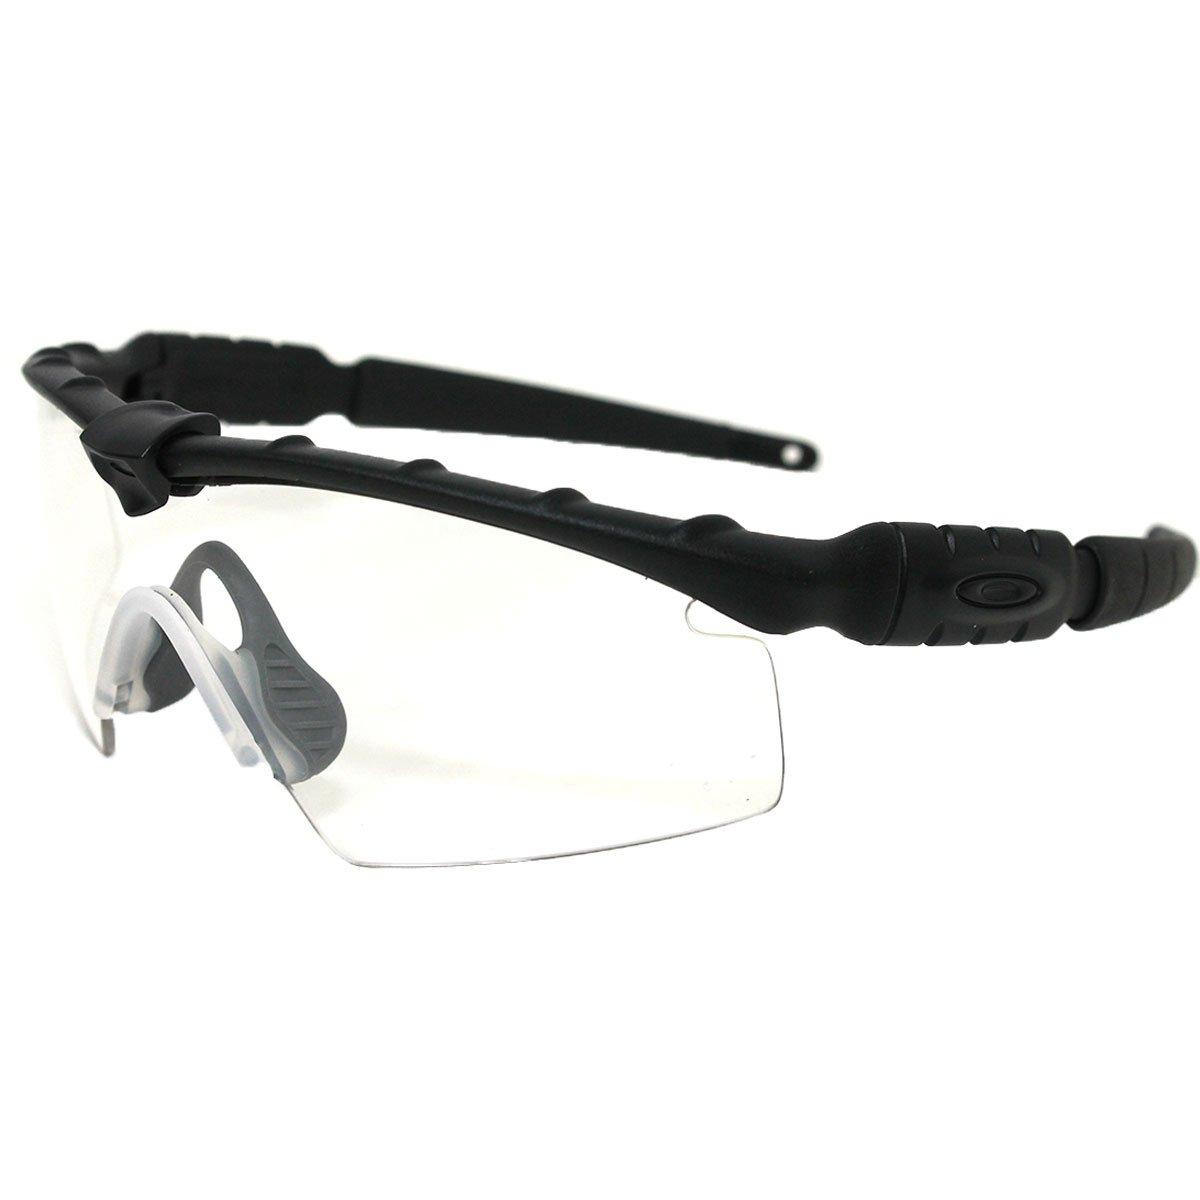 Oakley Men's Ballistic M Frame 2.0 Rectangular Sunglasses, Matte Black, 32 mm by Oakley